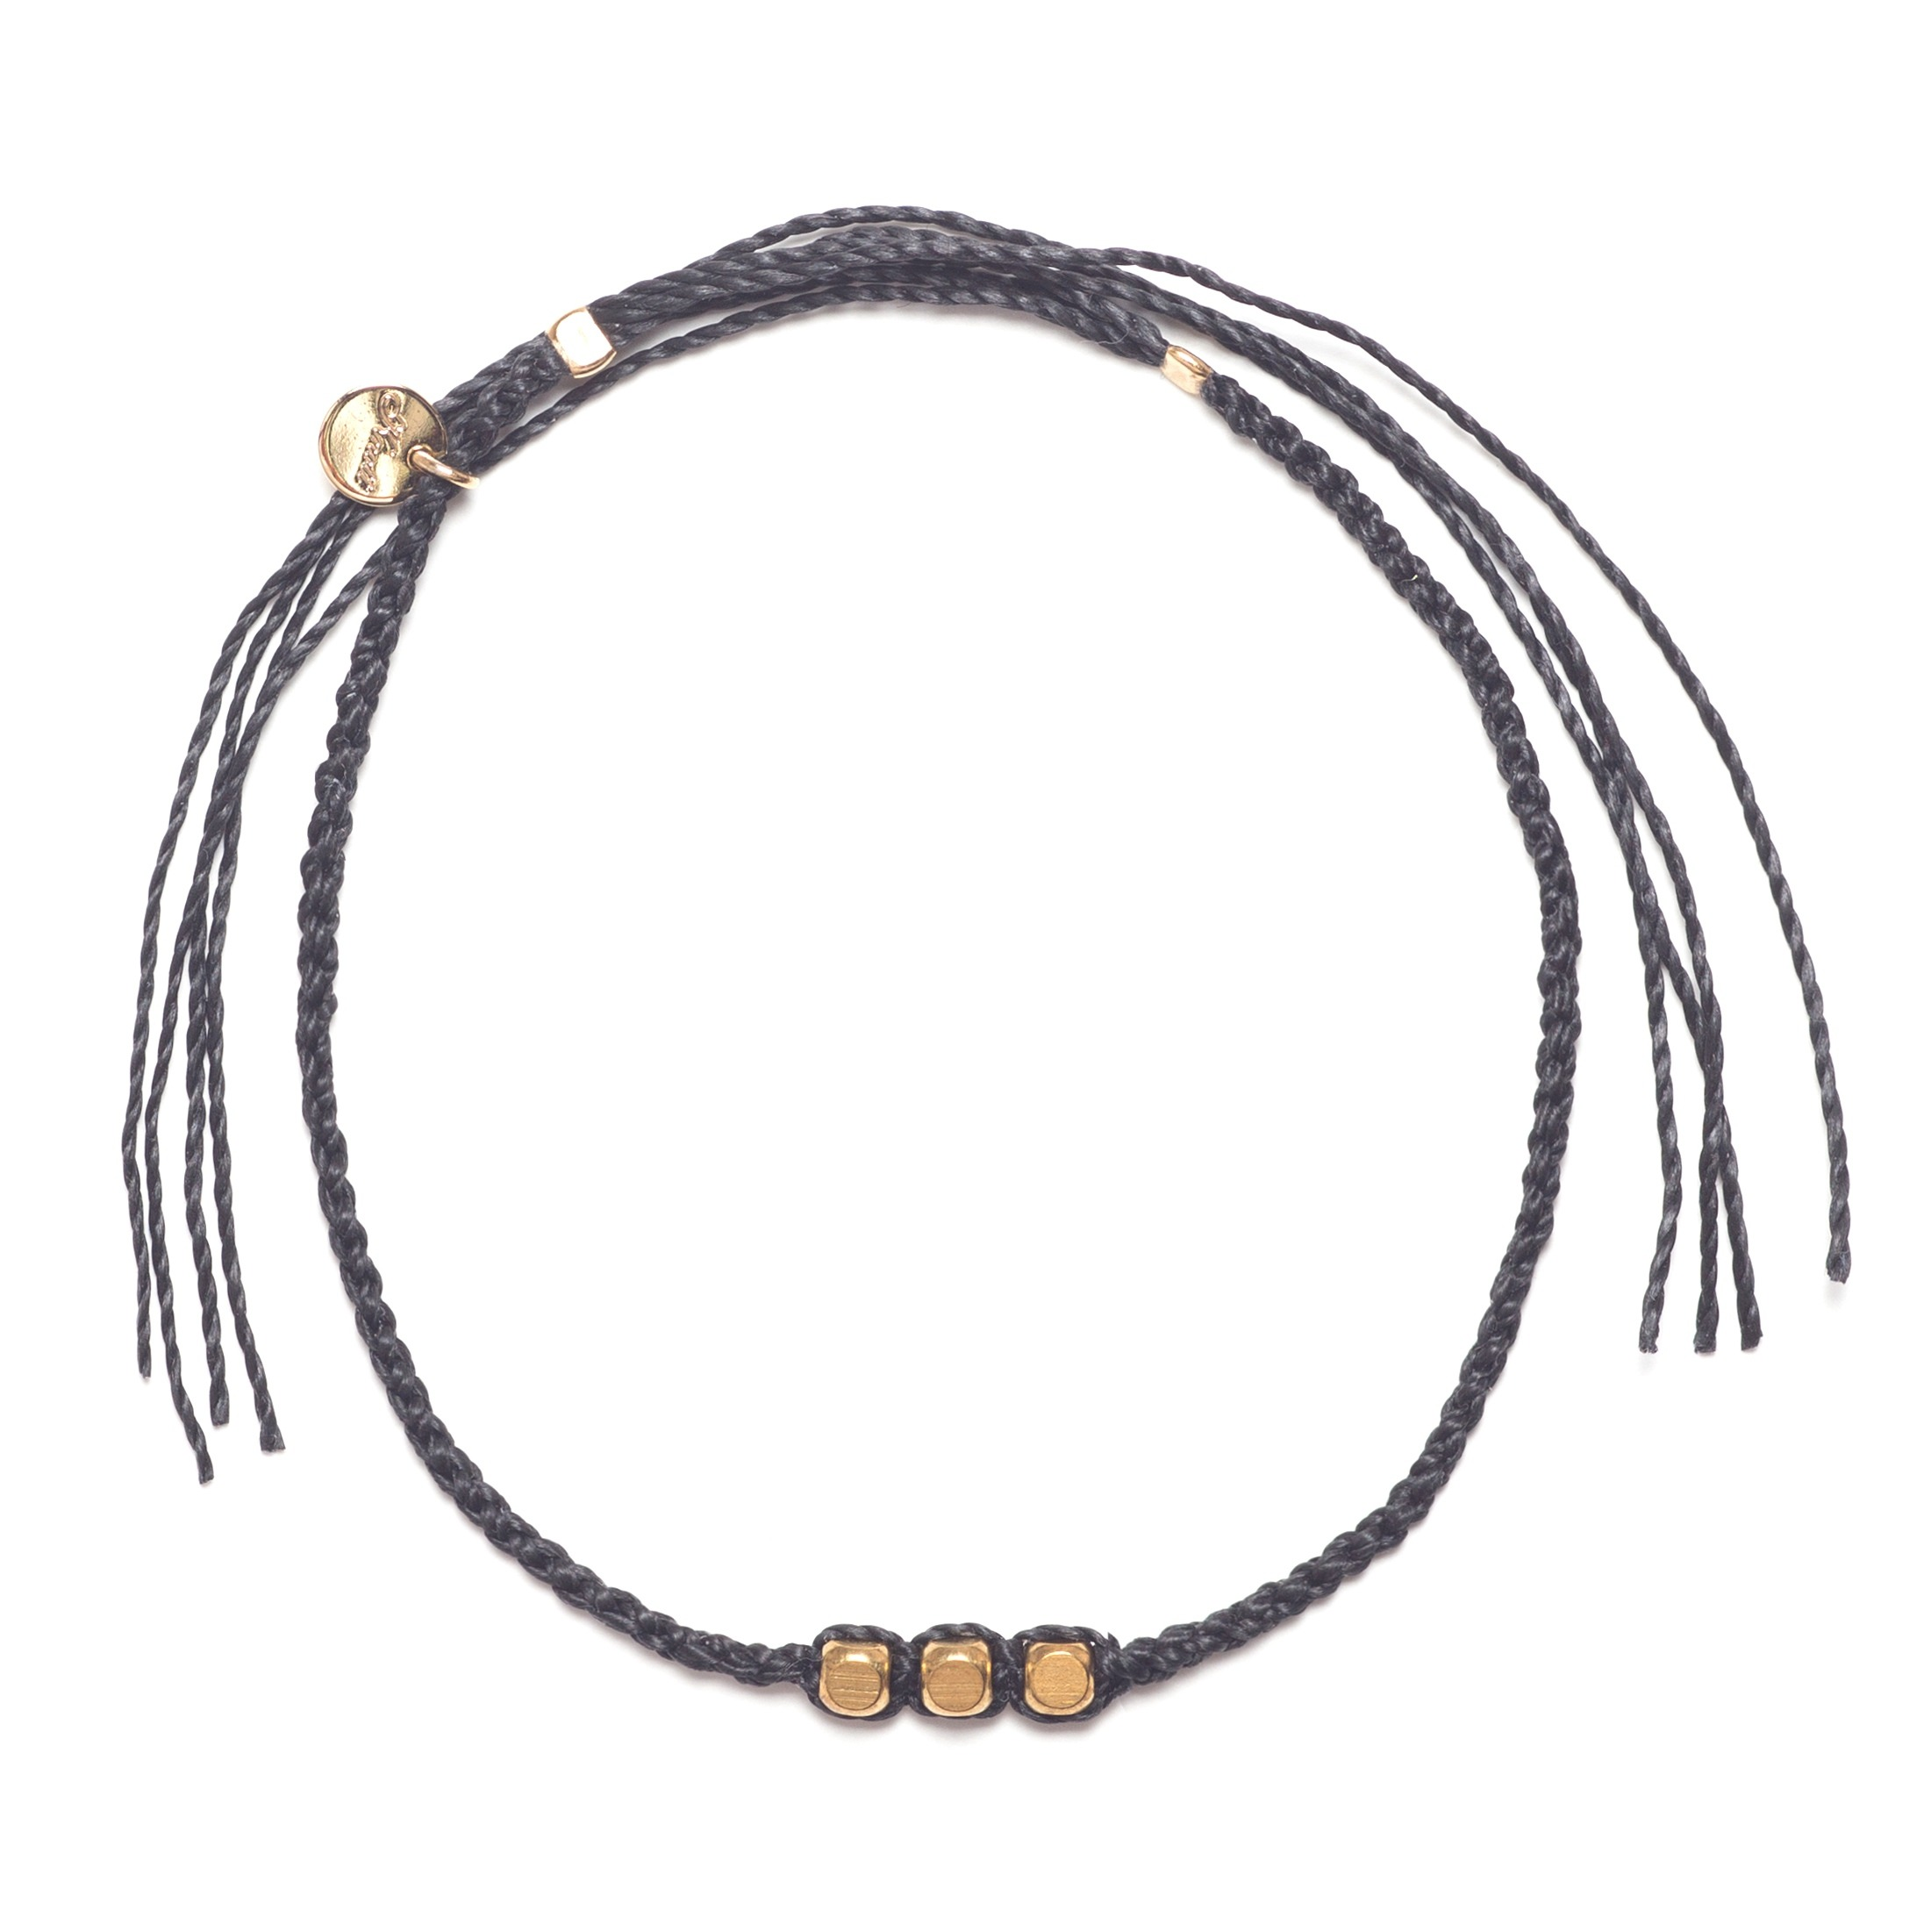 Brass Beads Misanga (Anklet/Bracelet)